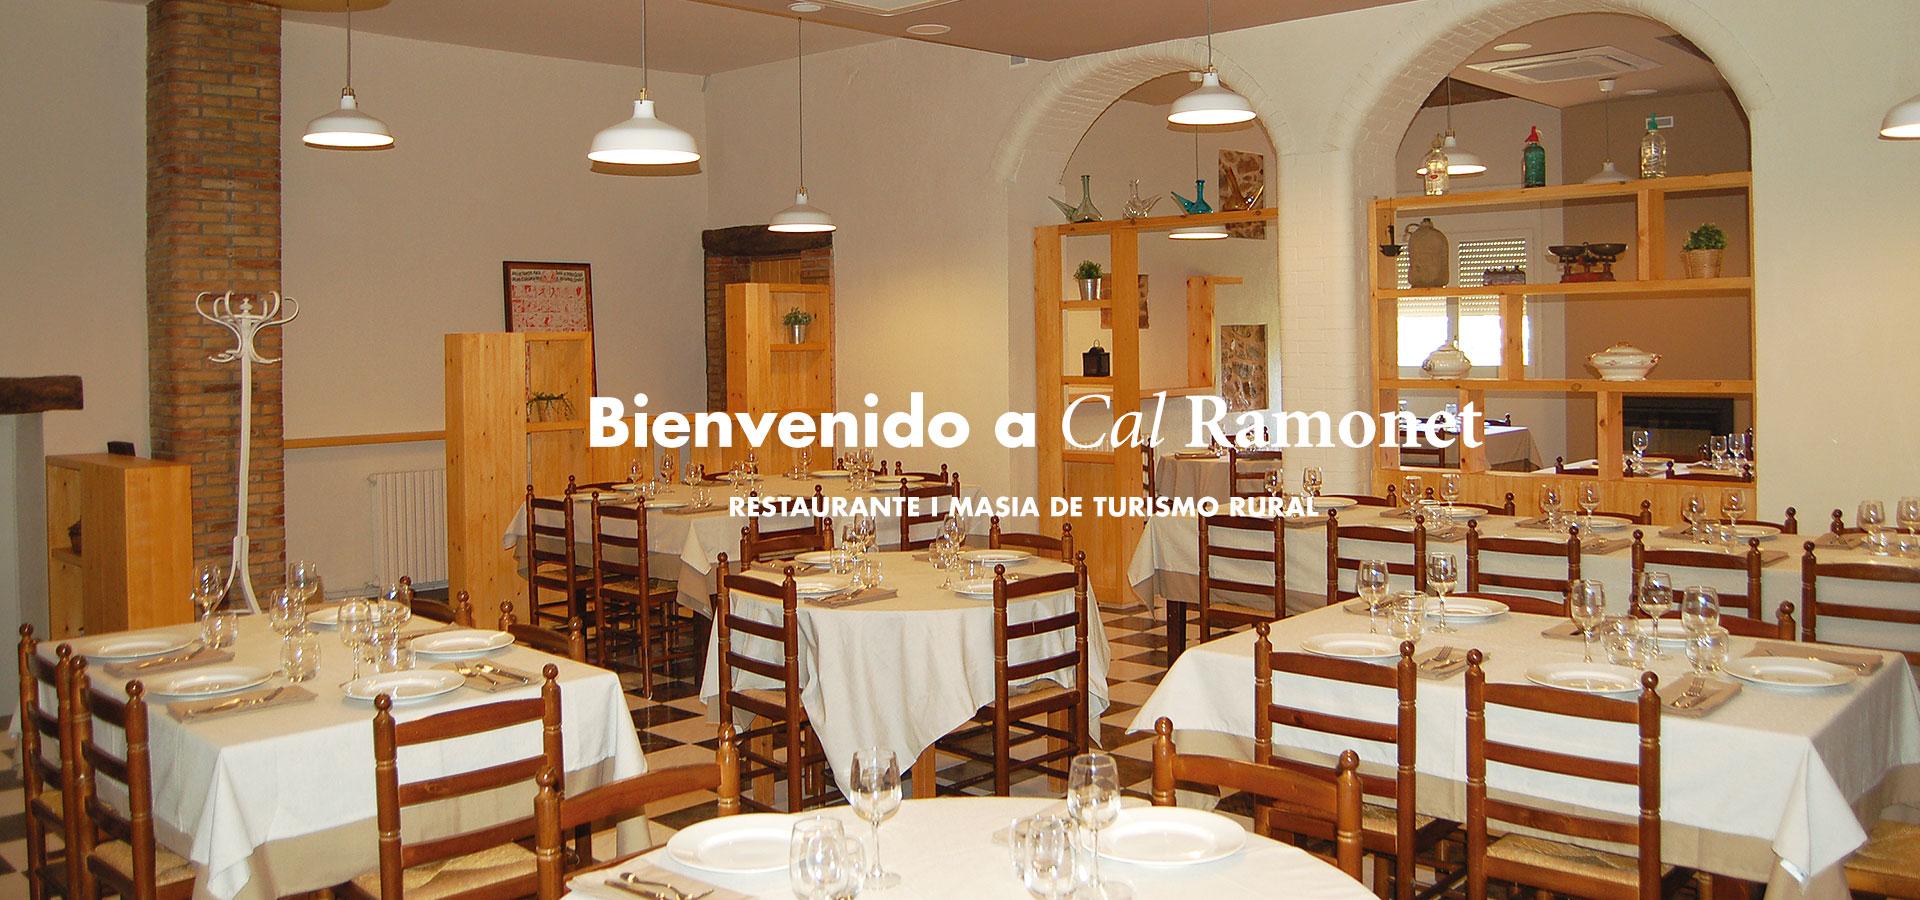 Cal-Ramonet-de-Miralles-3